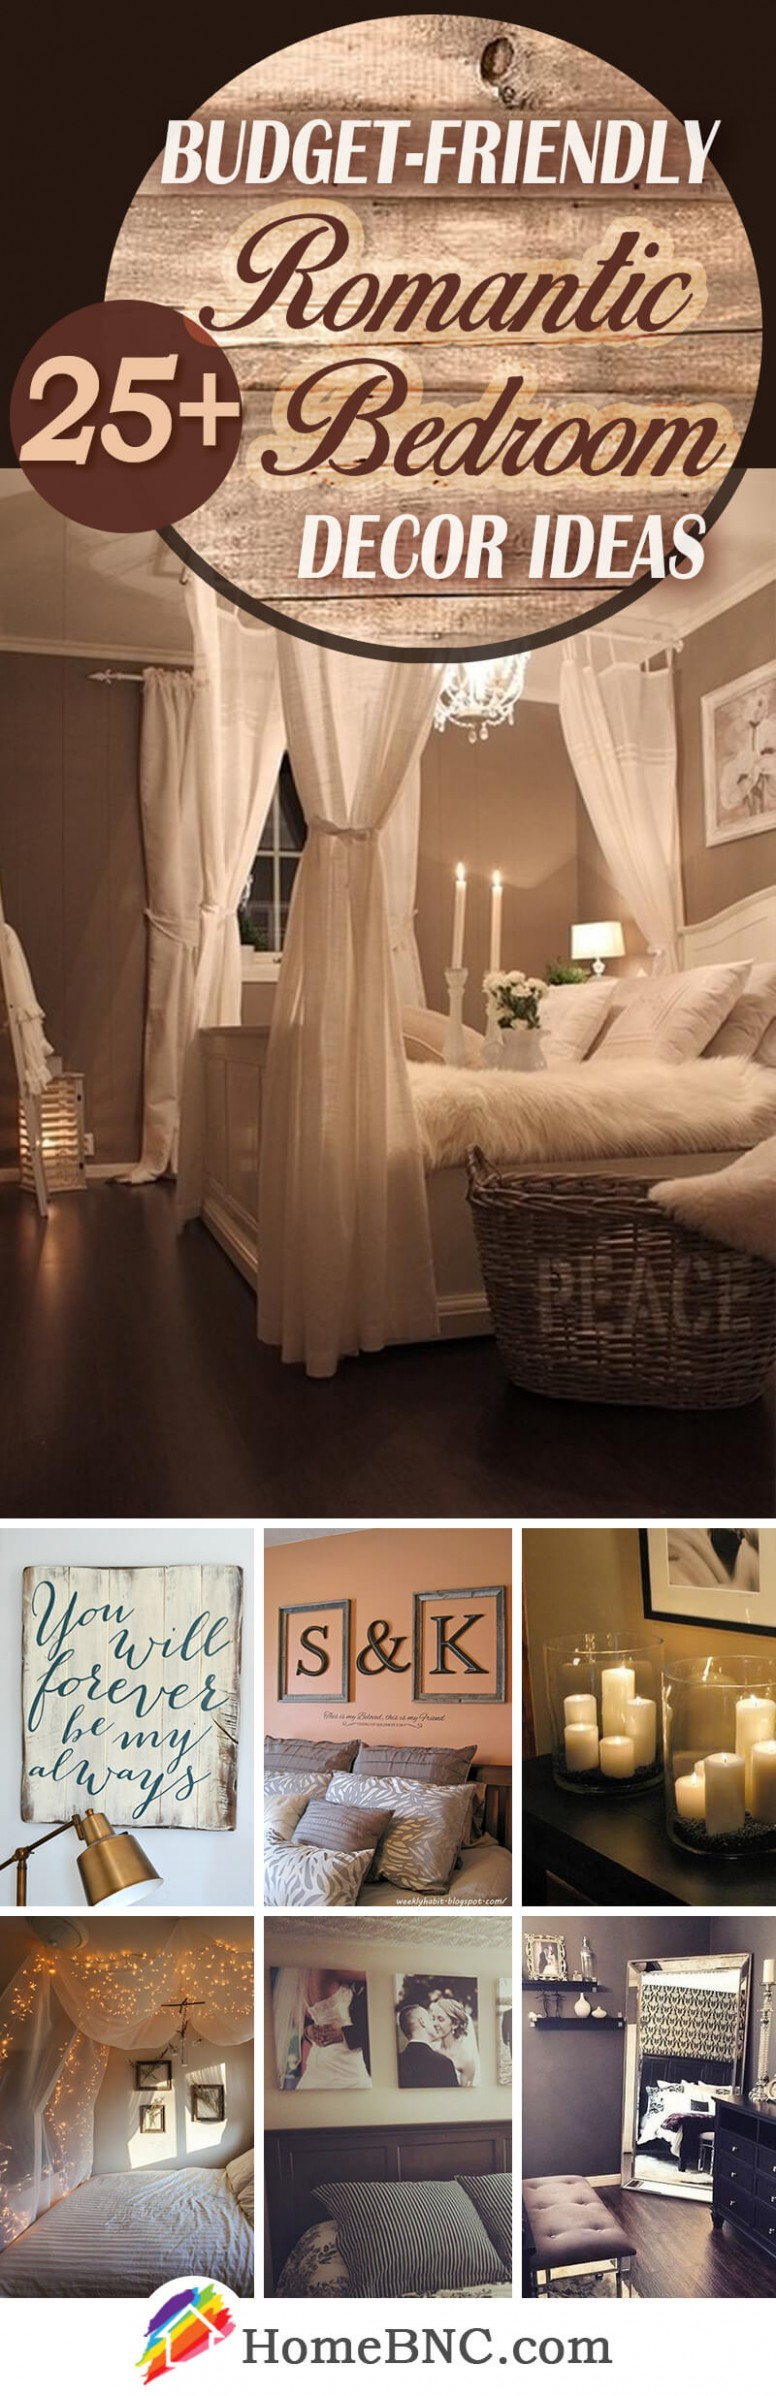 10+ Best Romantic Bedroom Decor Ideas and Designs for 10 - Bedroom Ideas Romantic